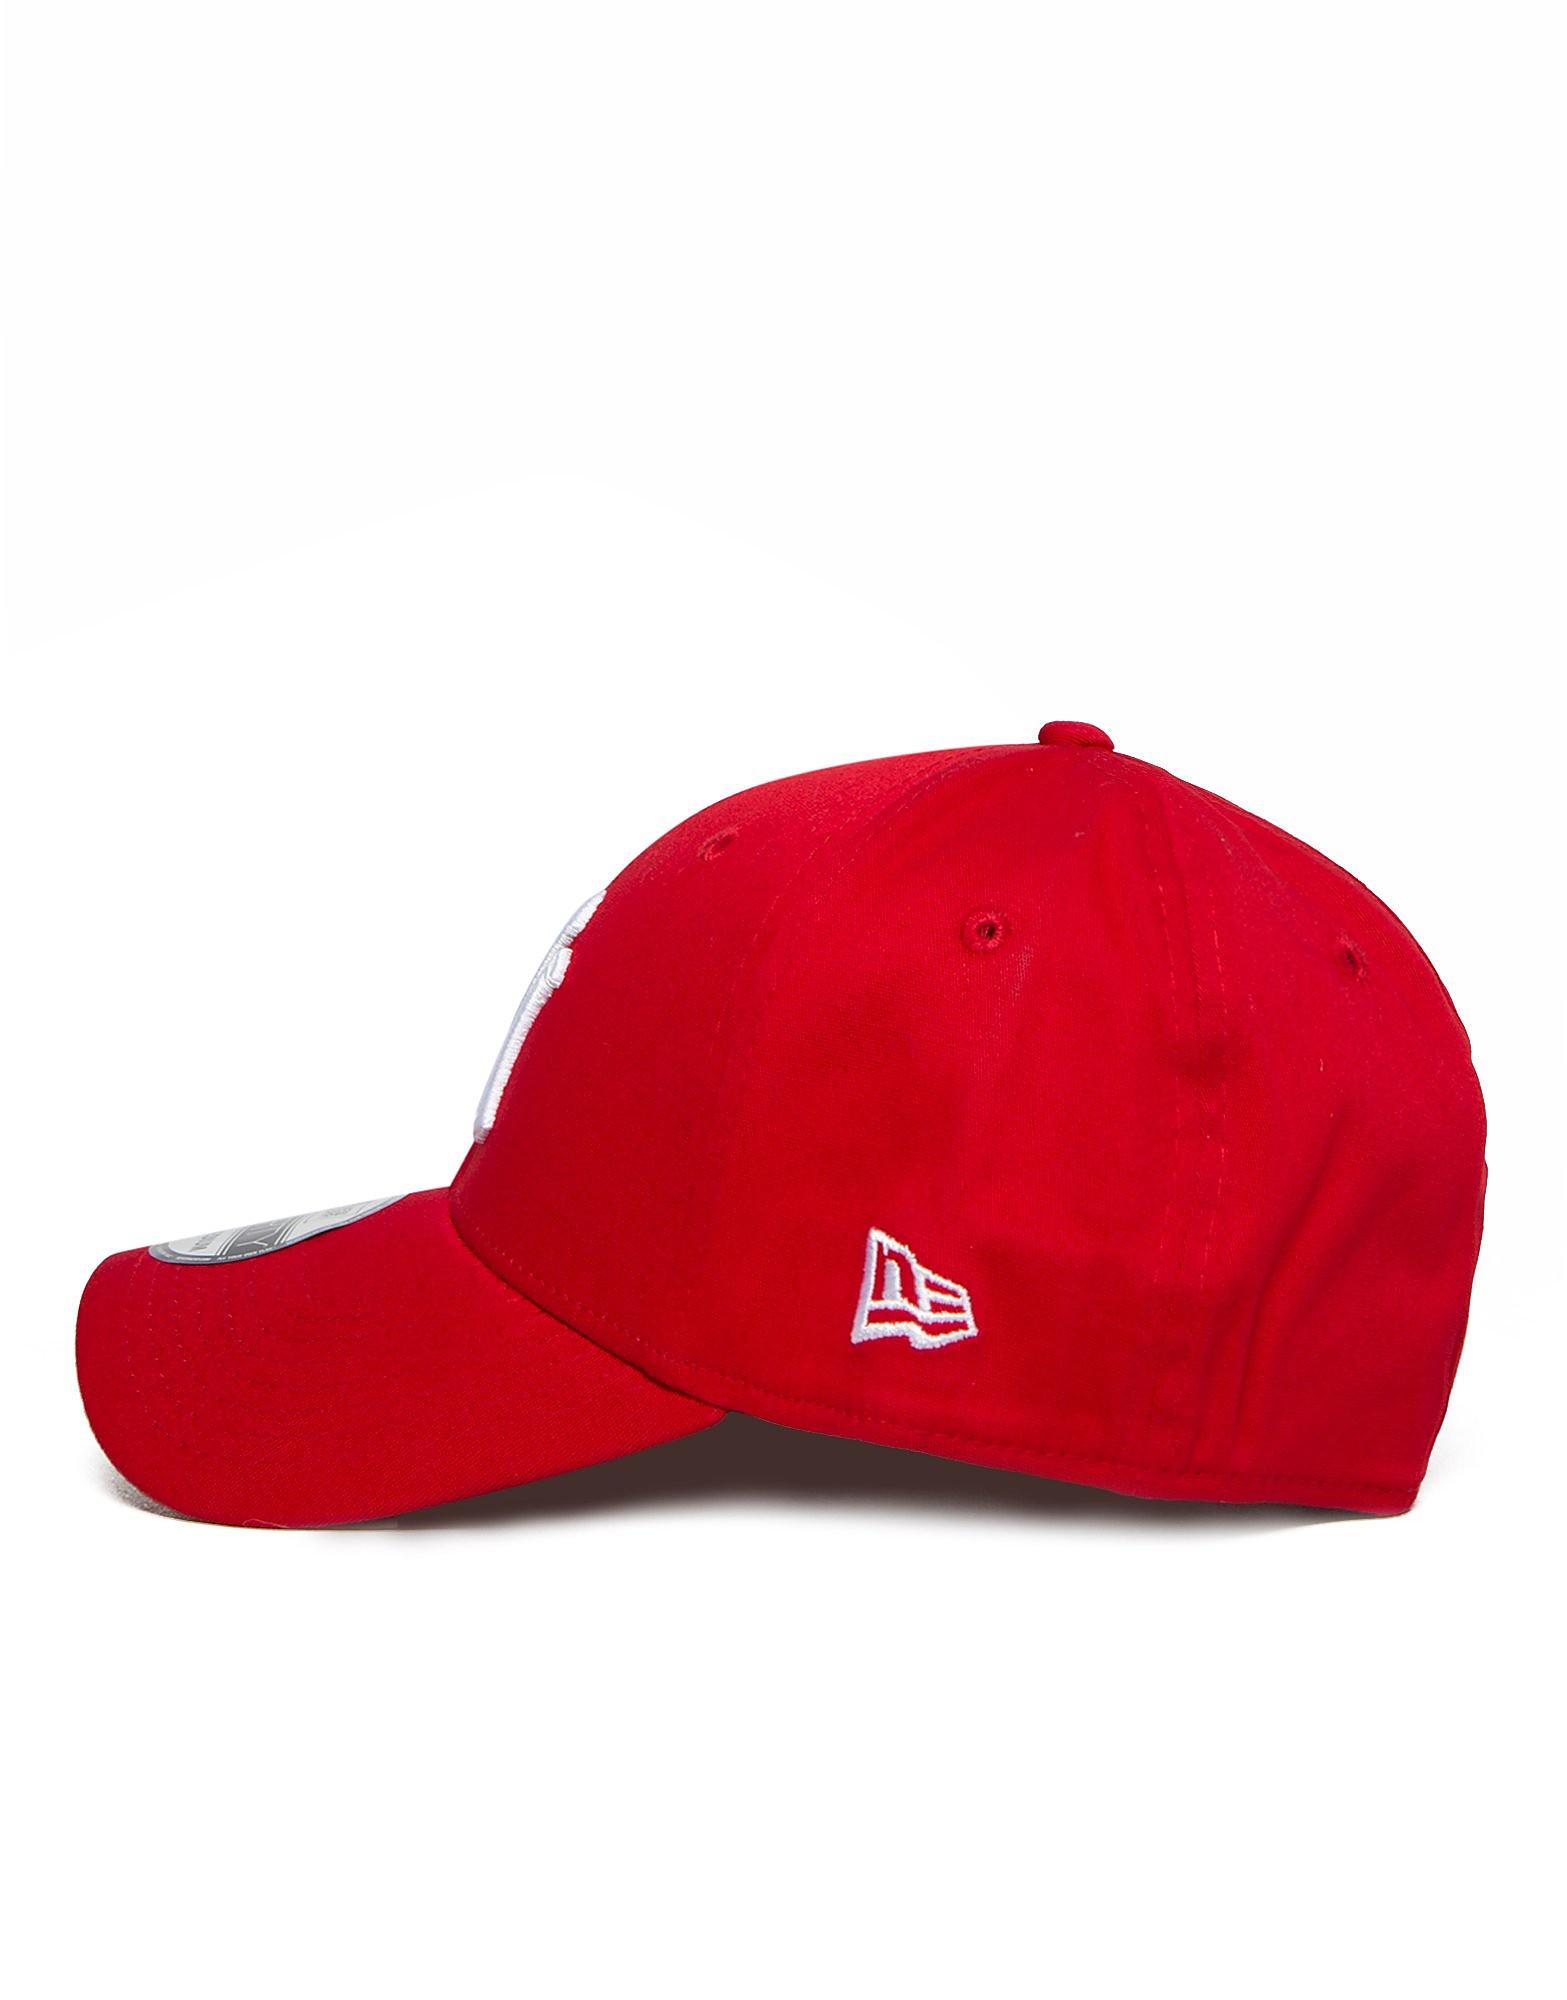 New Era New York Yankees 39THIRTY Fitted Cap